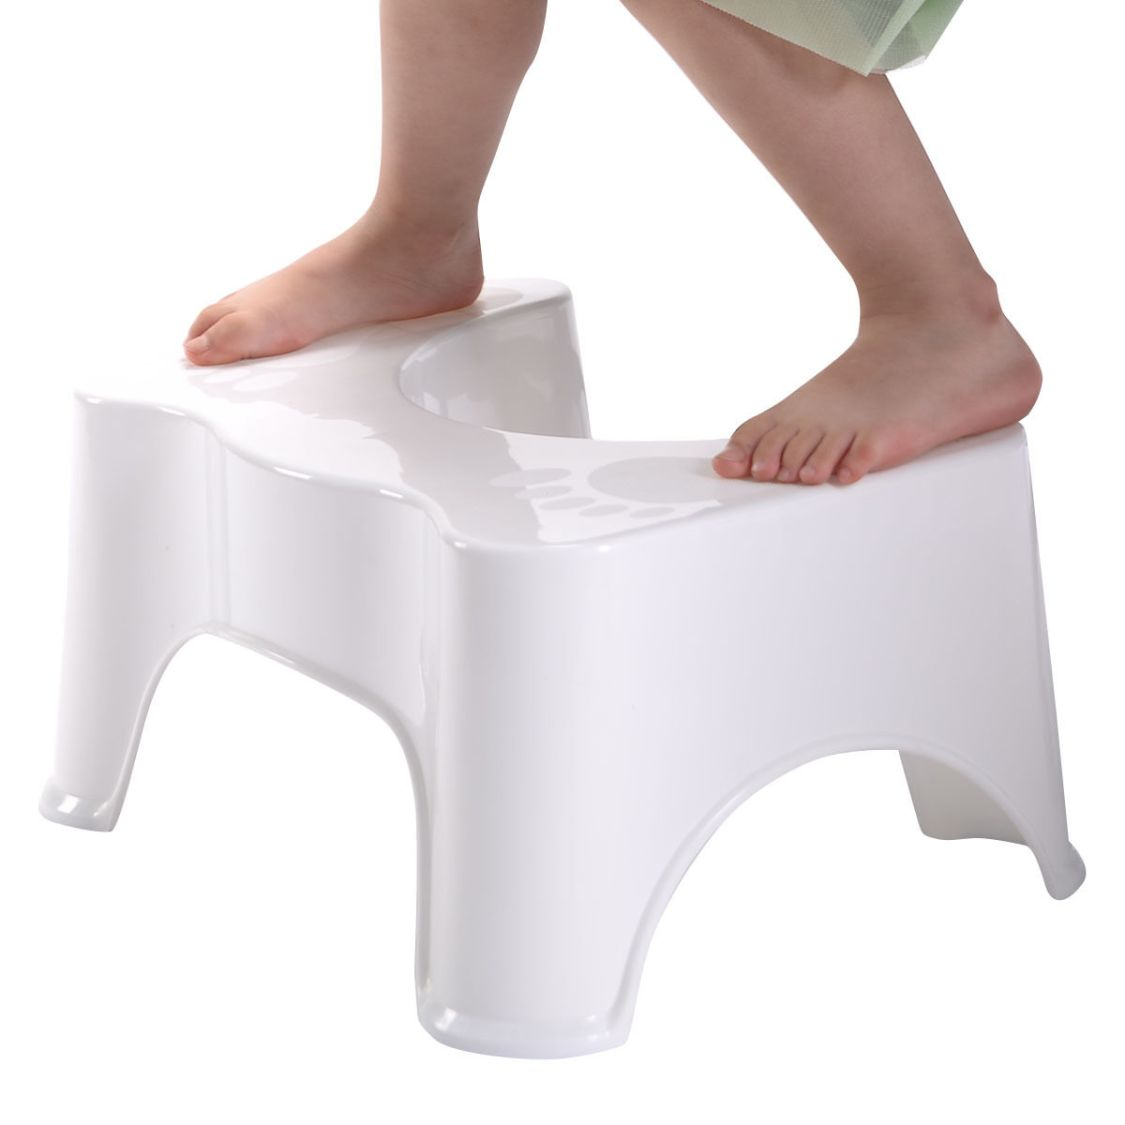 Medizinischer Toilettenhocker Toilettenstuhl Toilettenhilfe Tritthocker